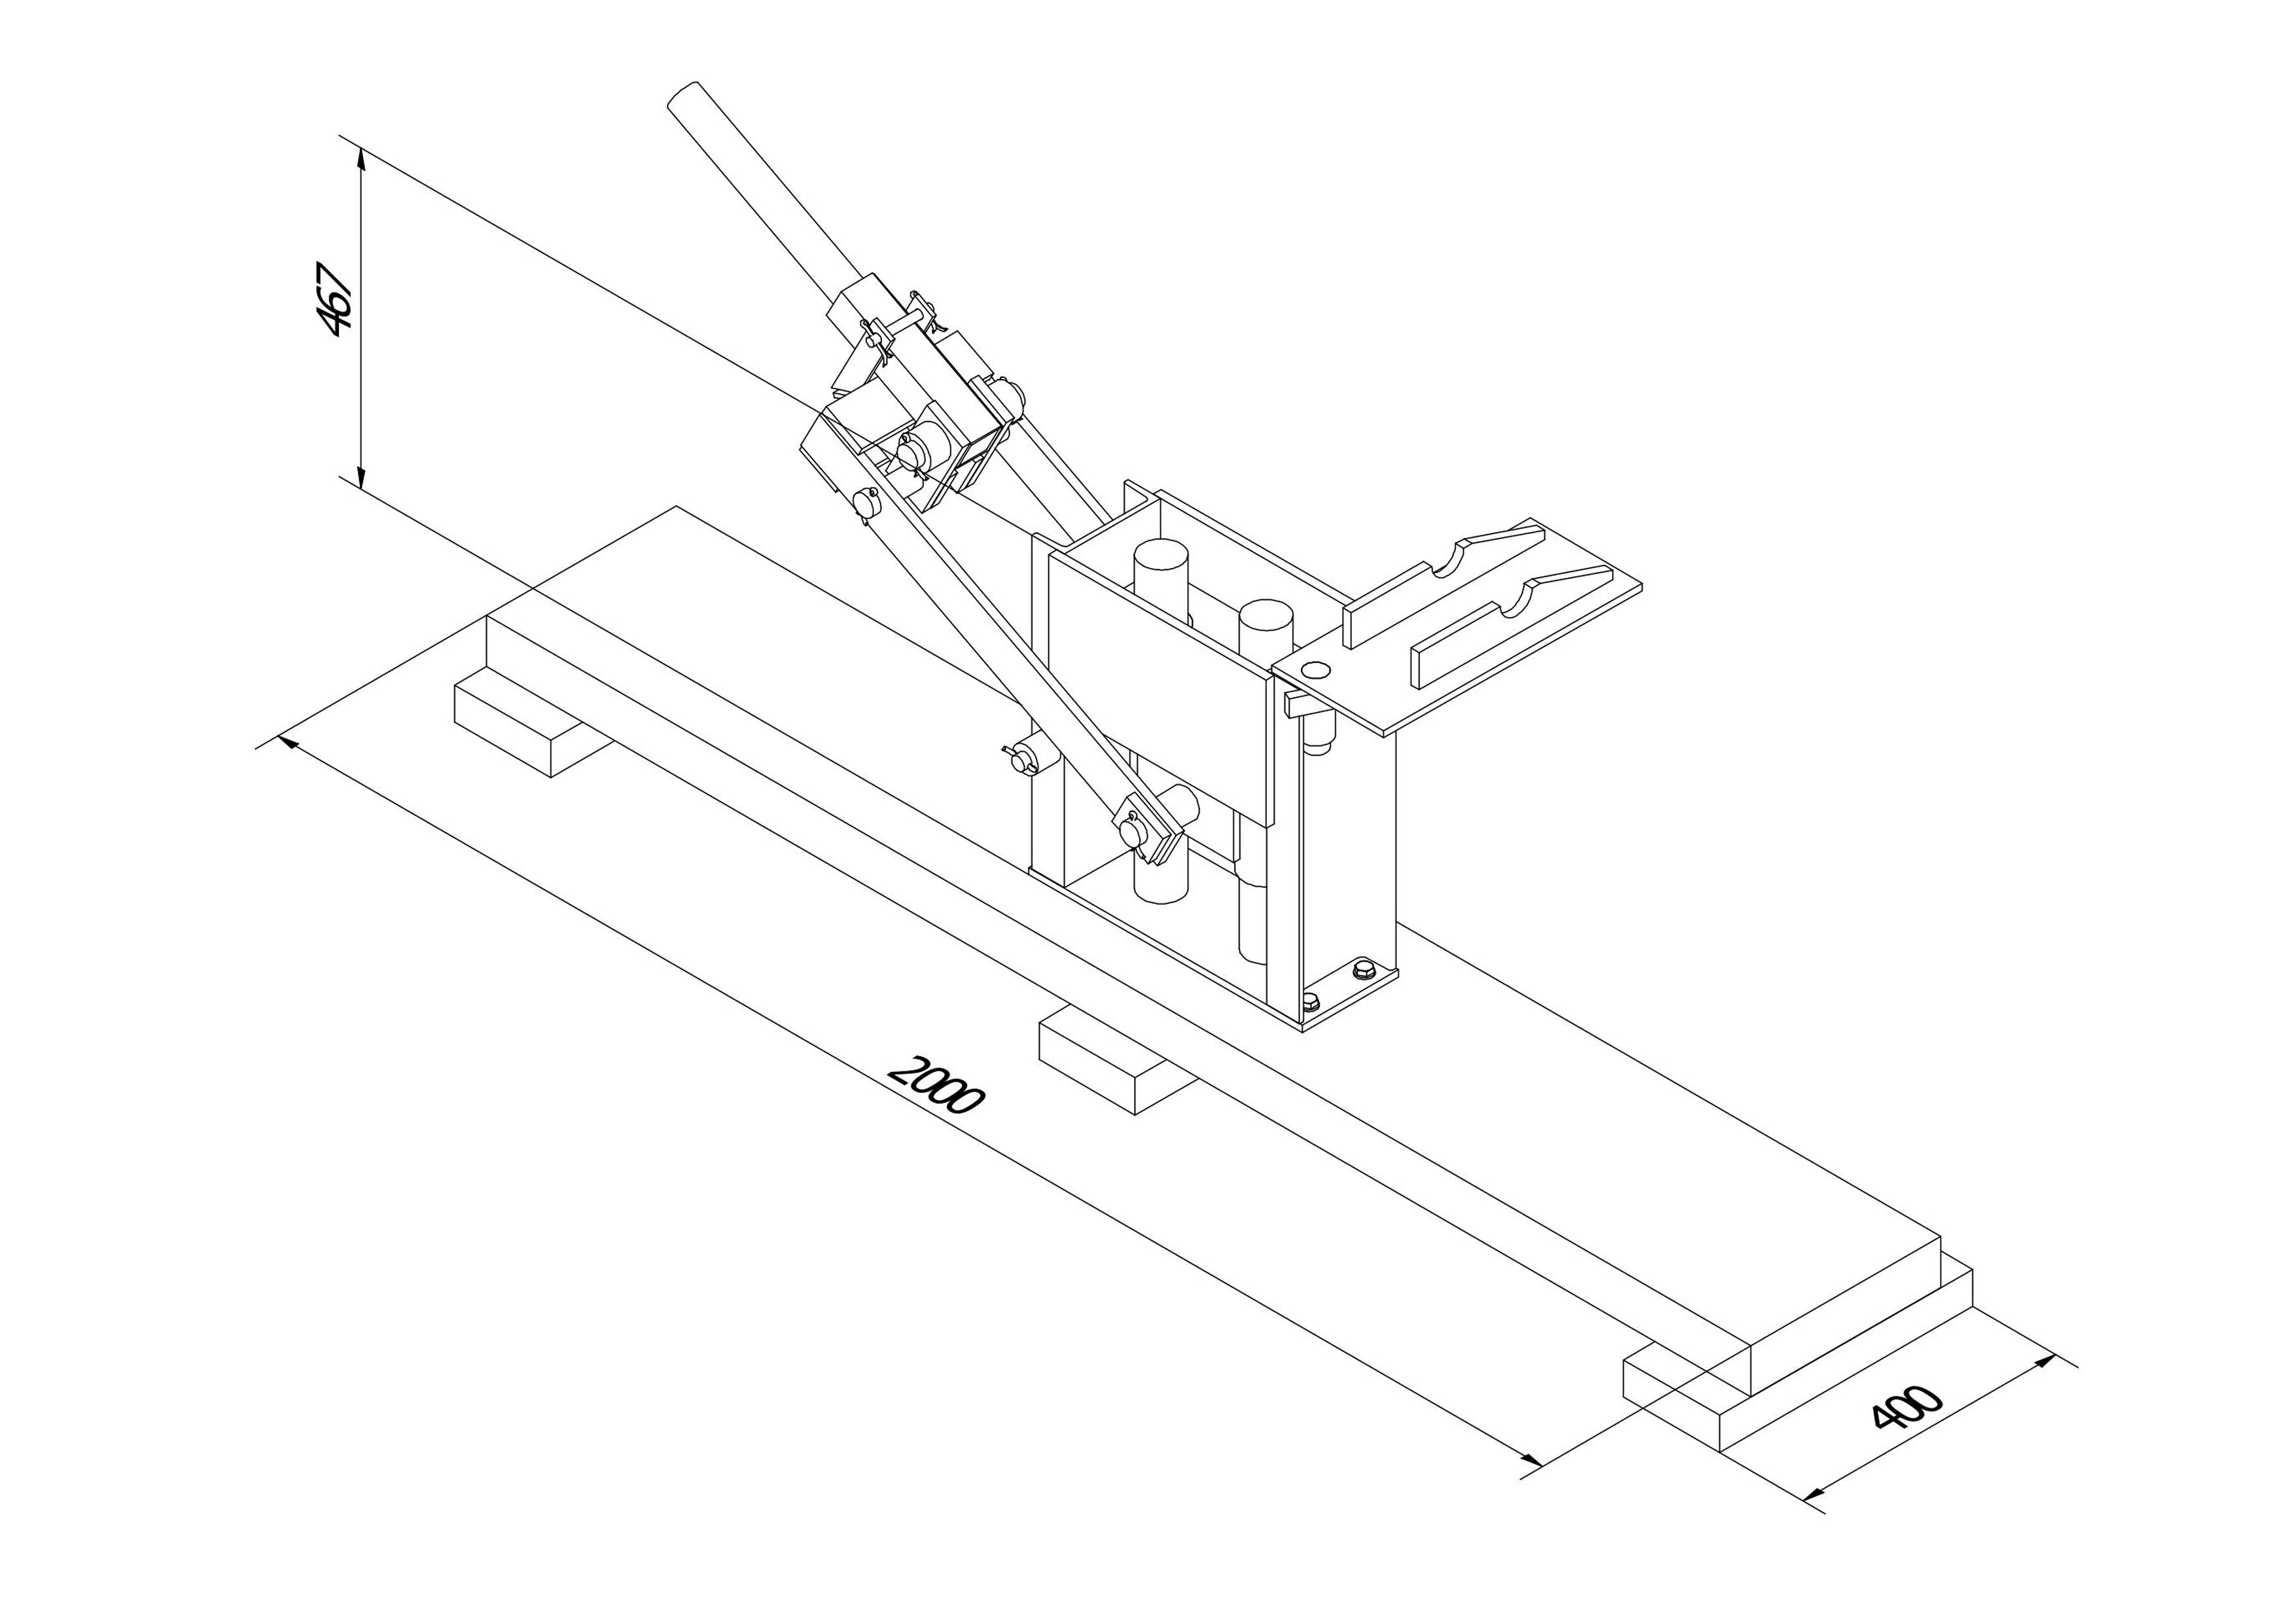 Cta bmc brick making machine ceta-ram for soil bricks 0000.jpg